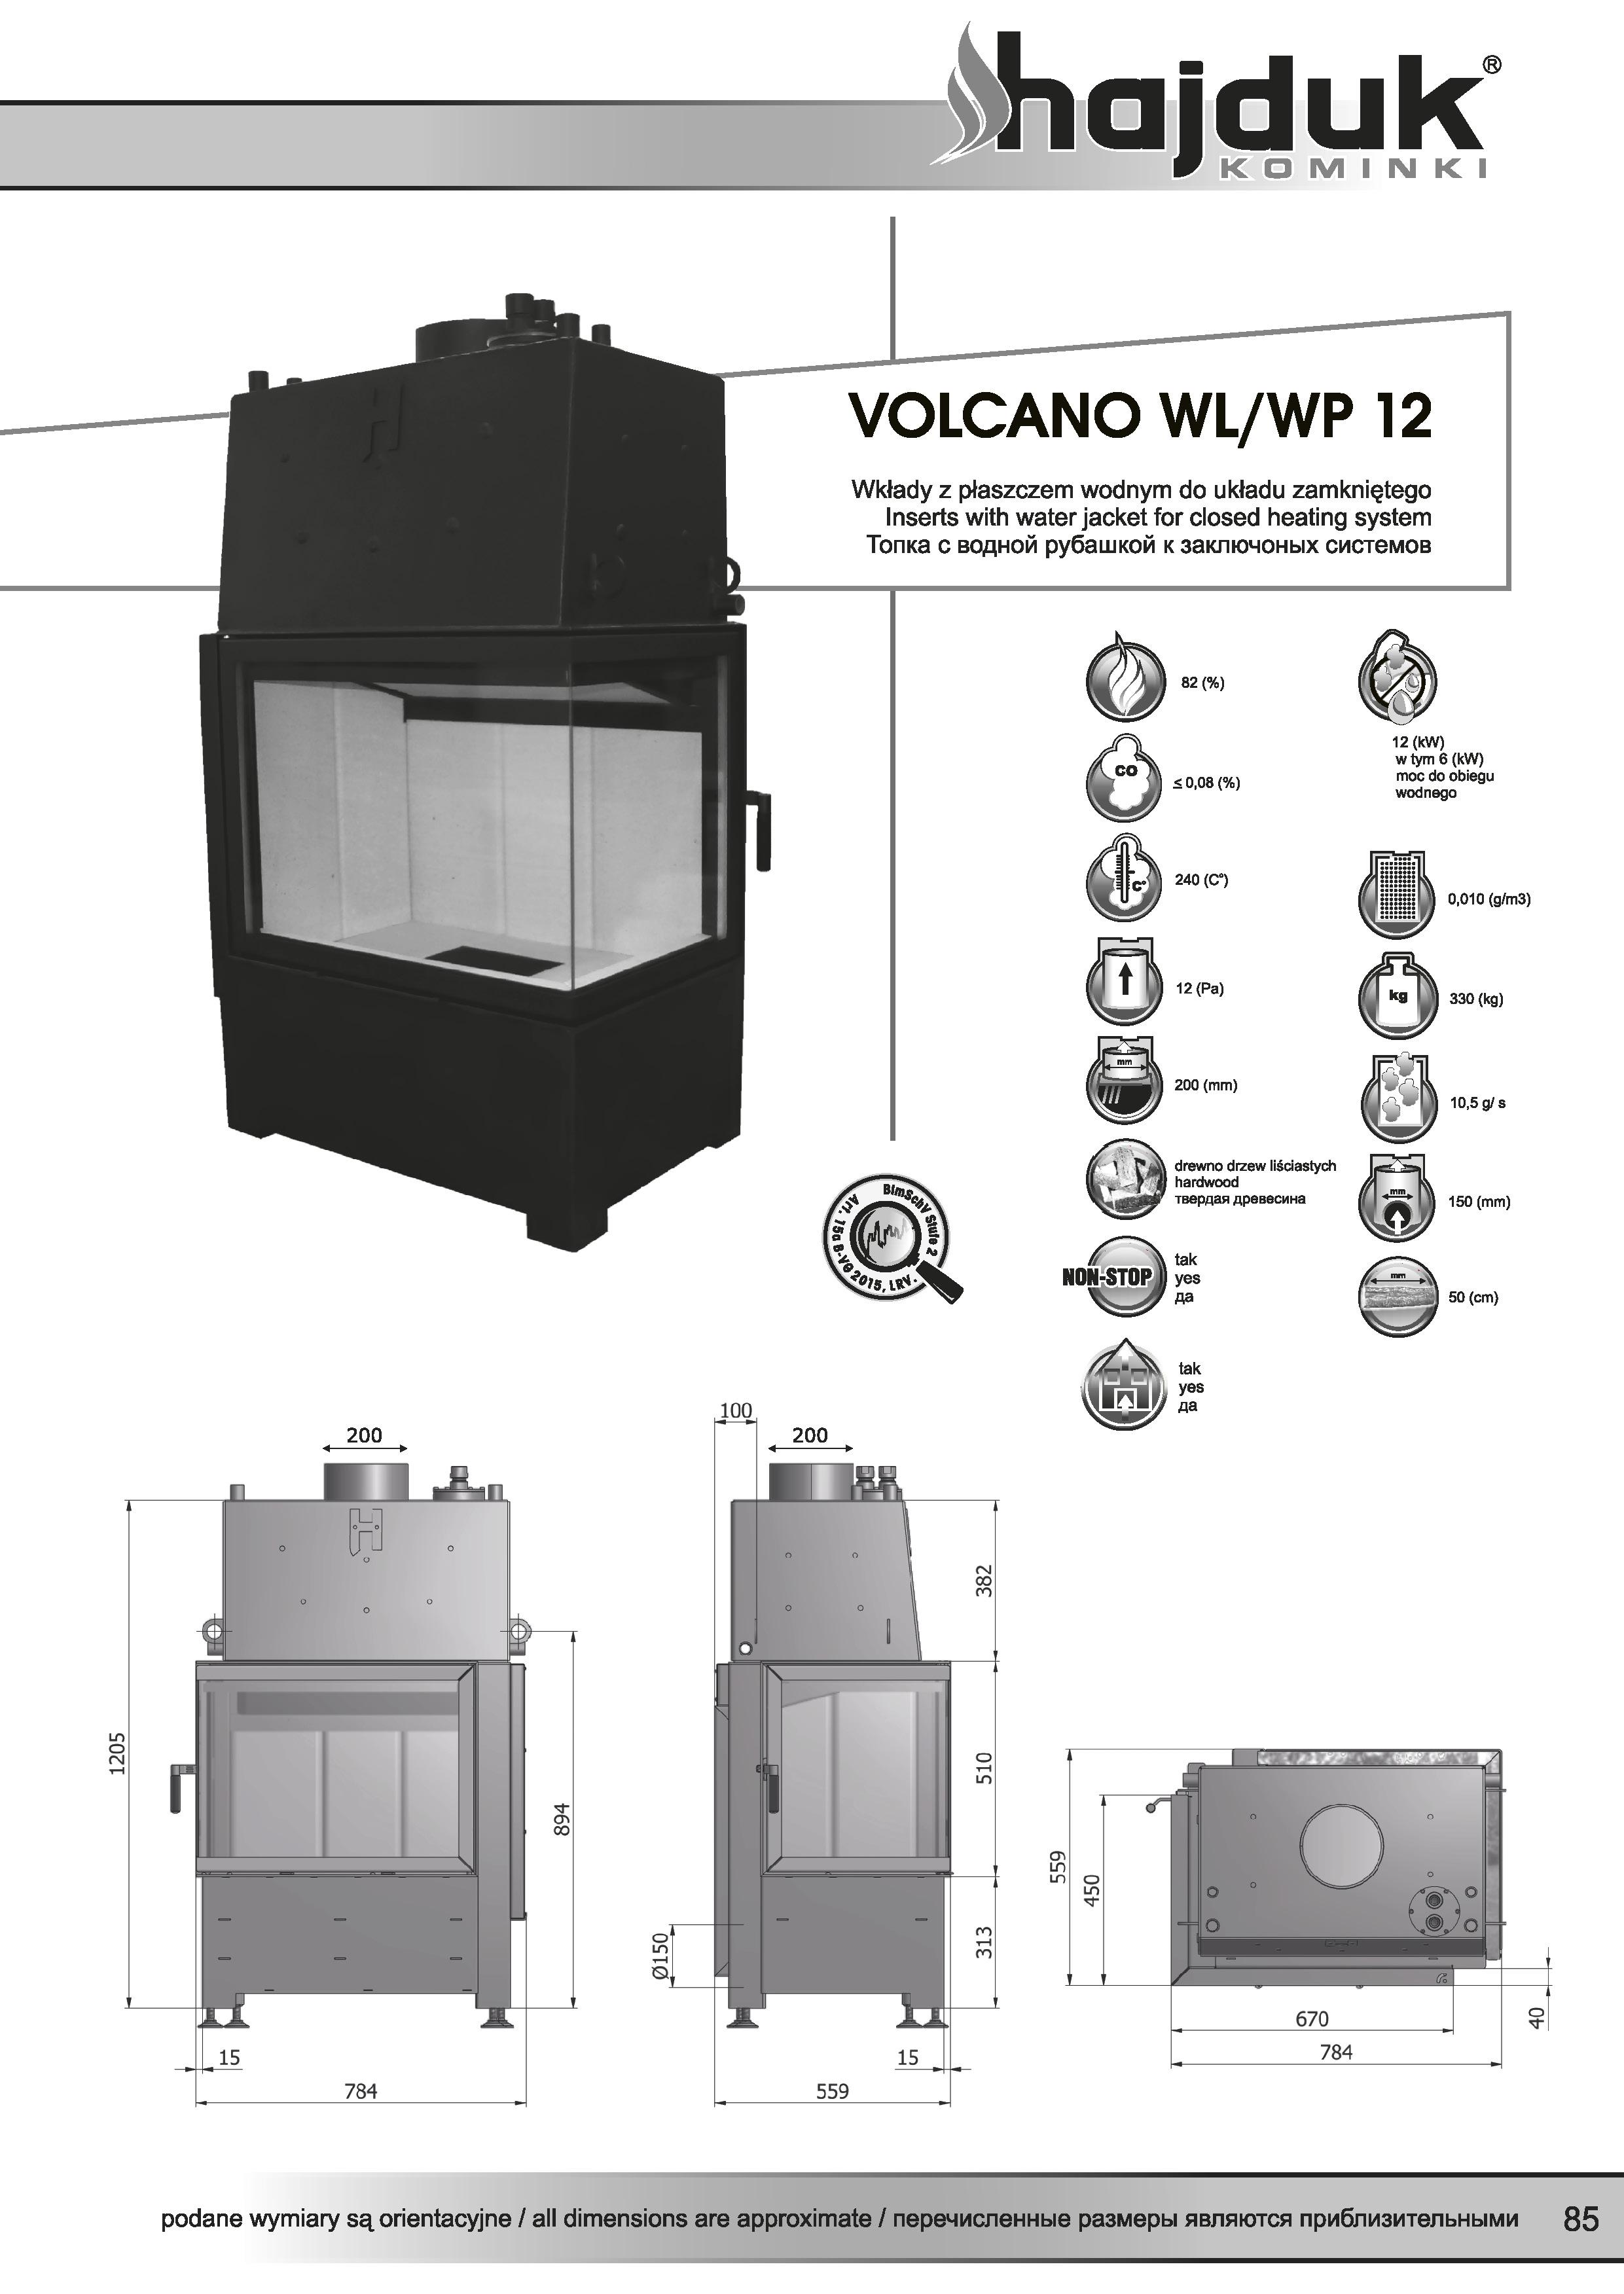 Volcano%20WL%20WP%20 %2012%20 %20karta%20techniczna - Fireplace insert Hajduk Volcano WP 12